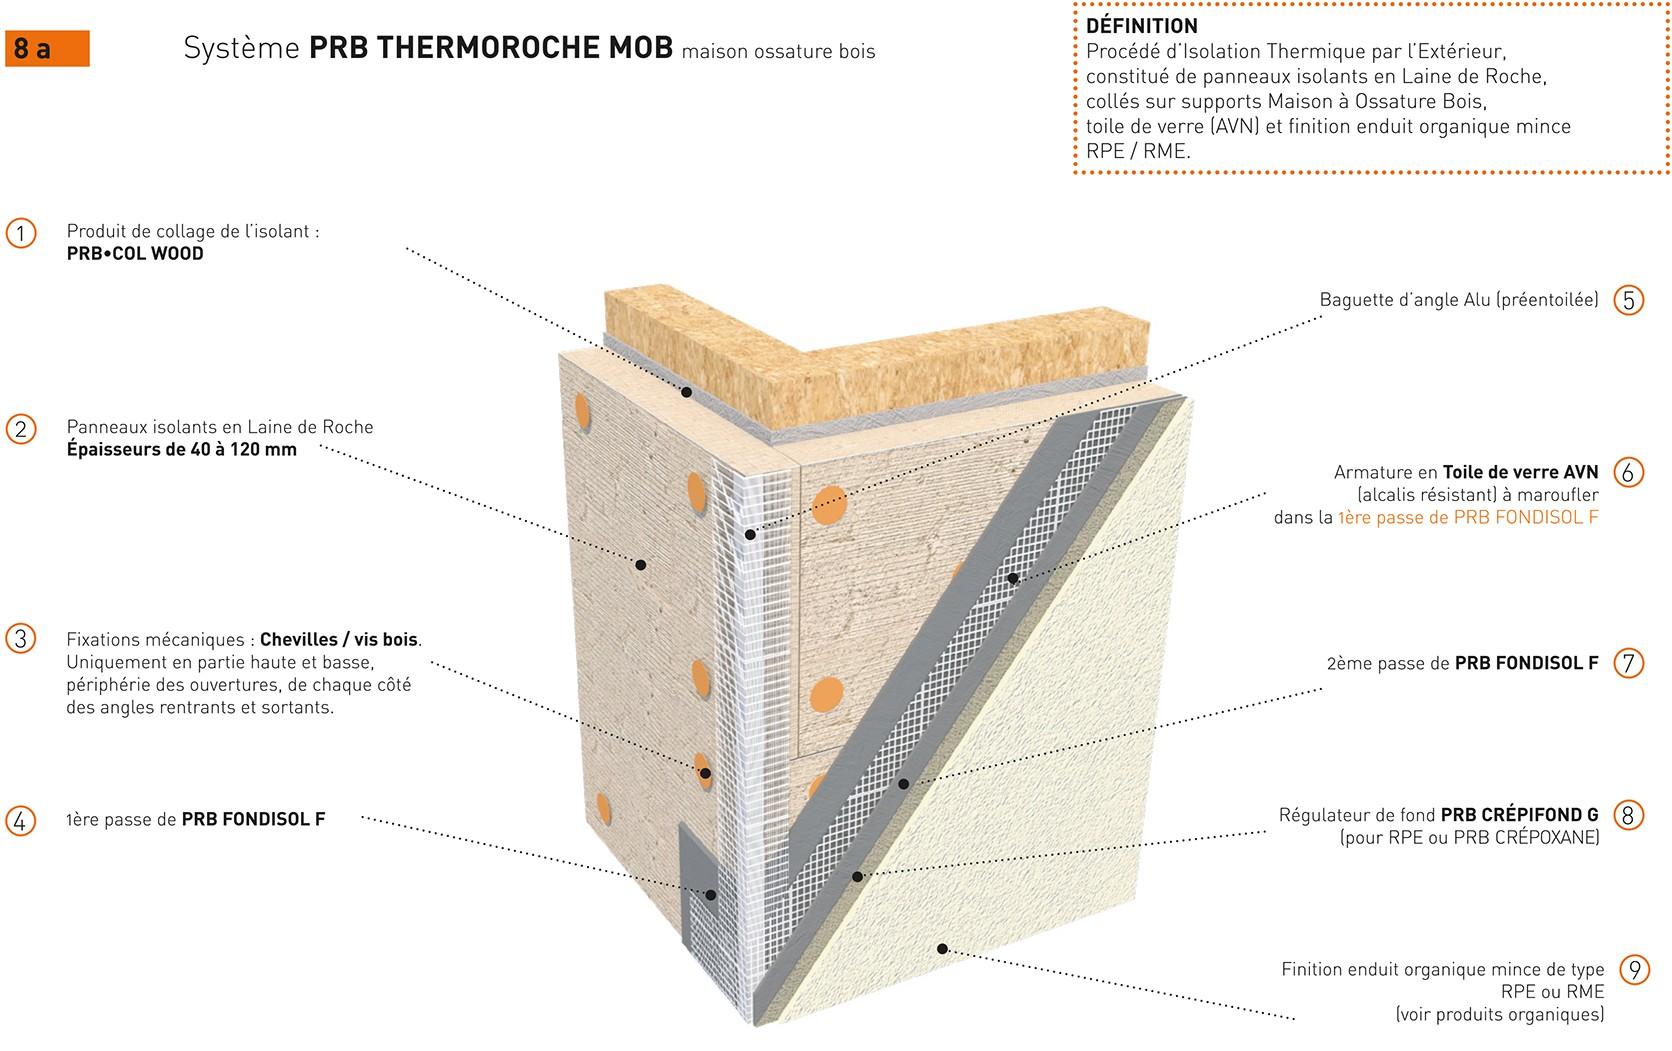 SYSTEME PRB THERMOROCHE MOB